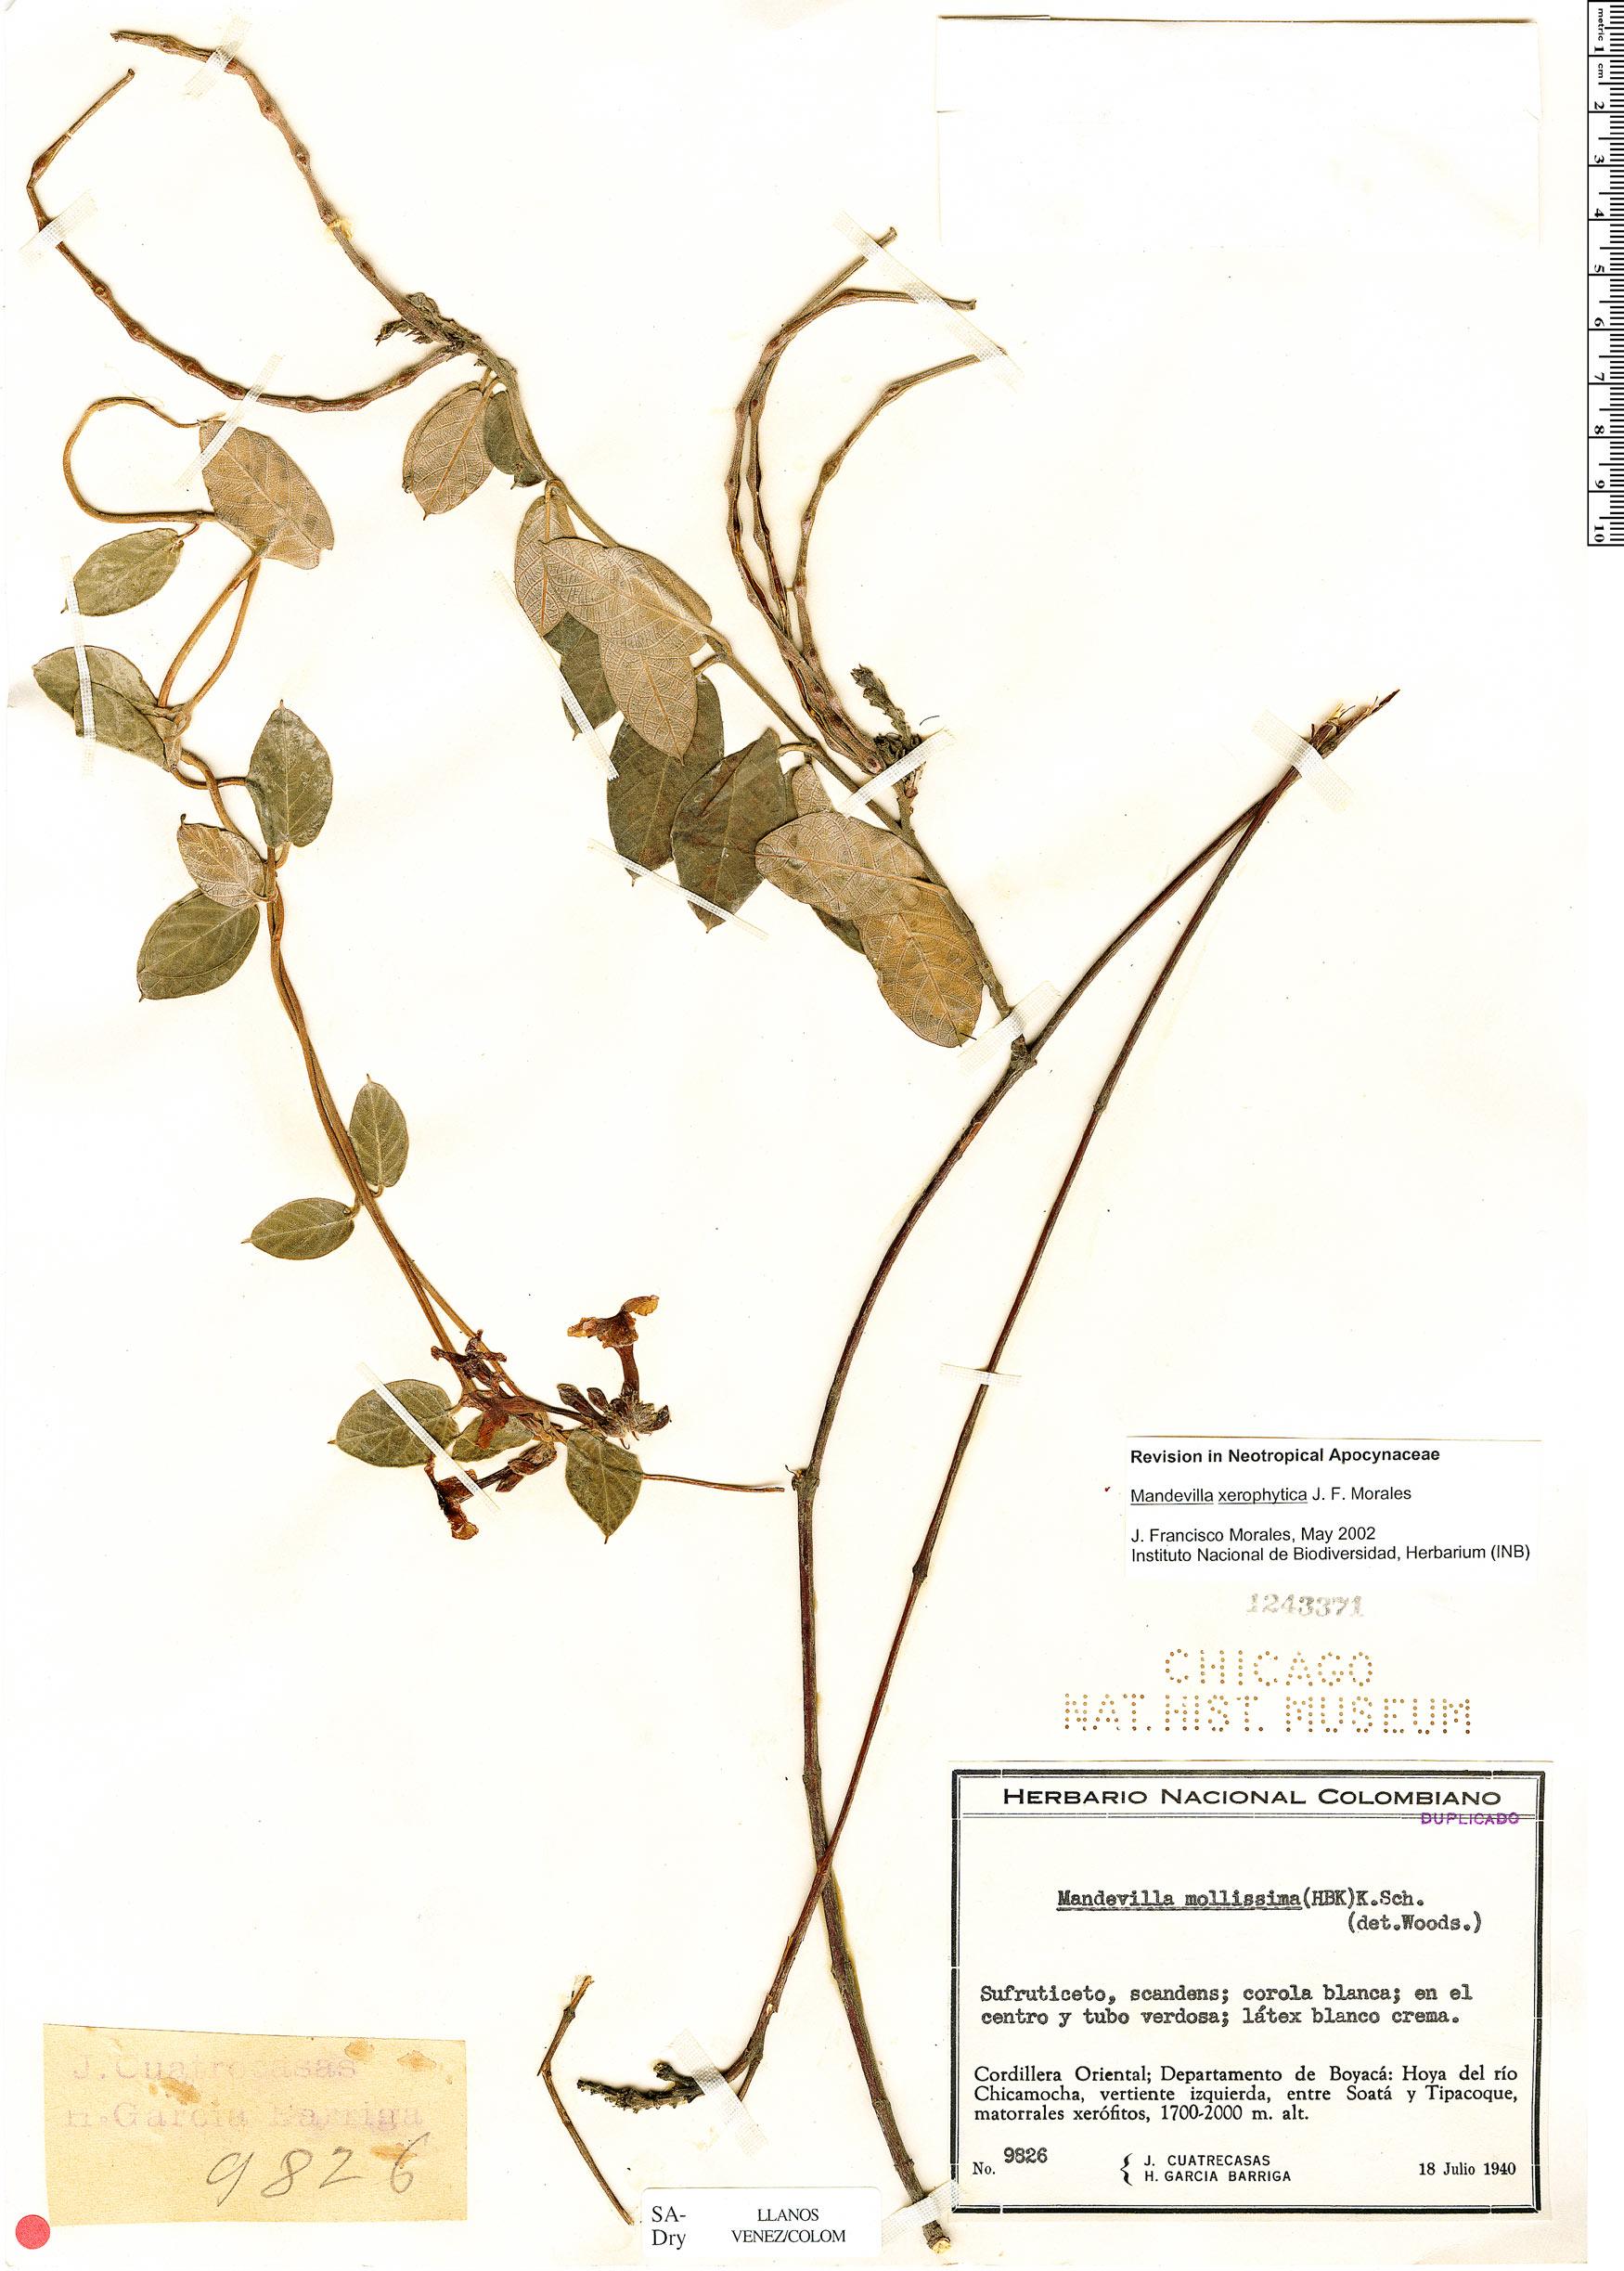 Specimen: Mandevilla xerophytica